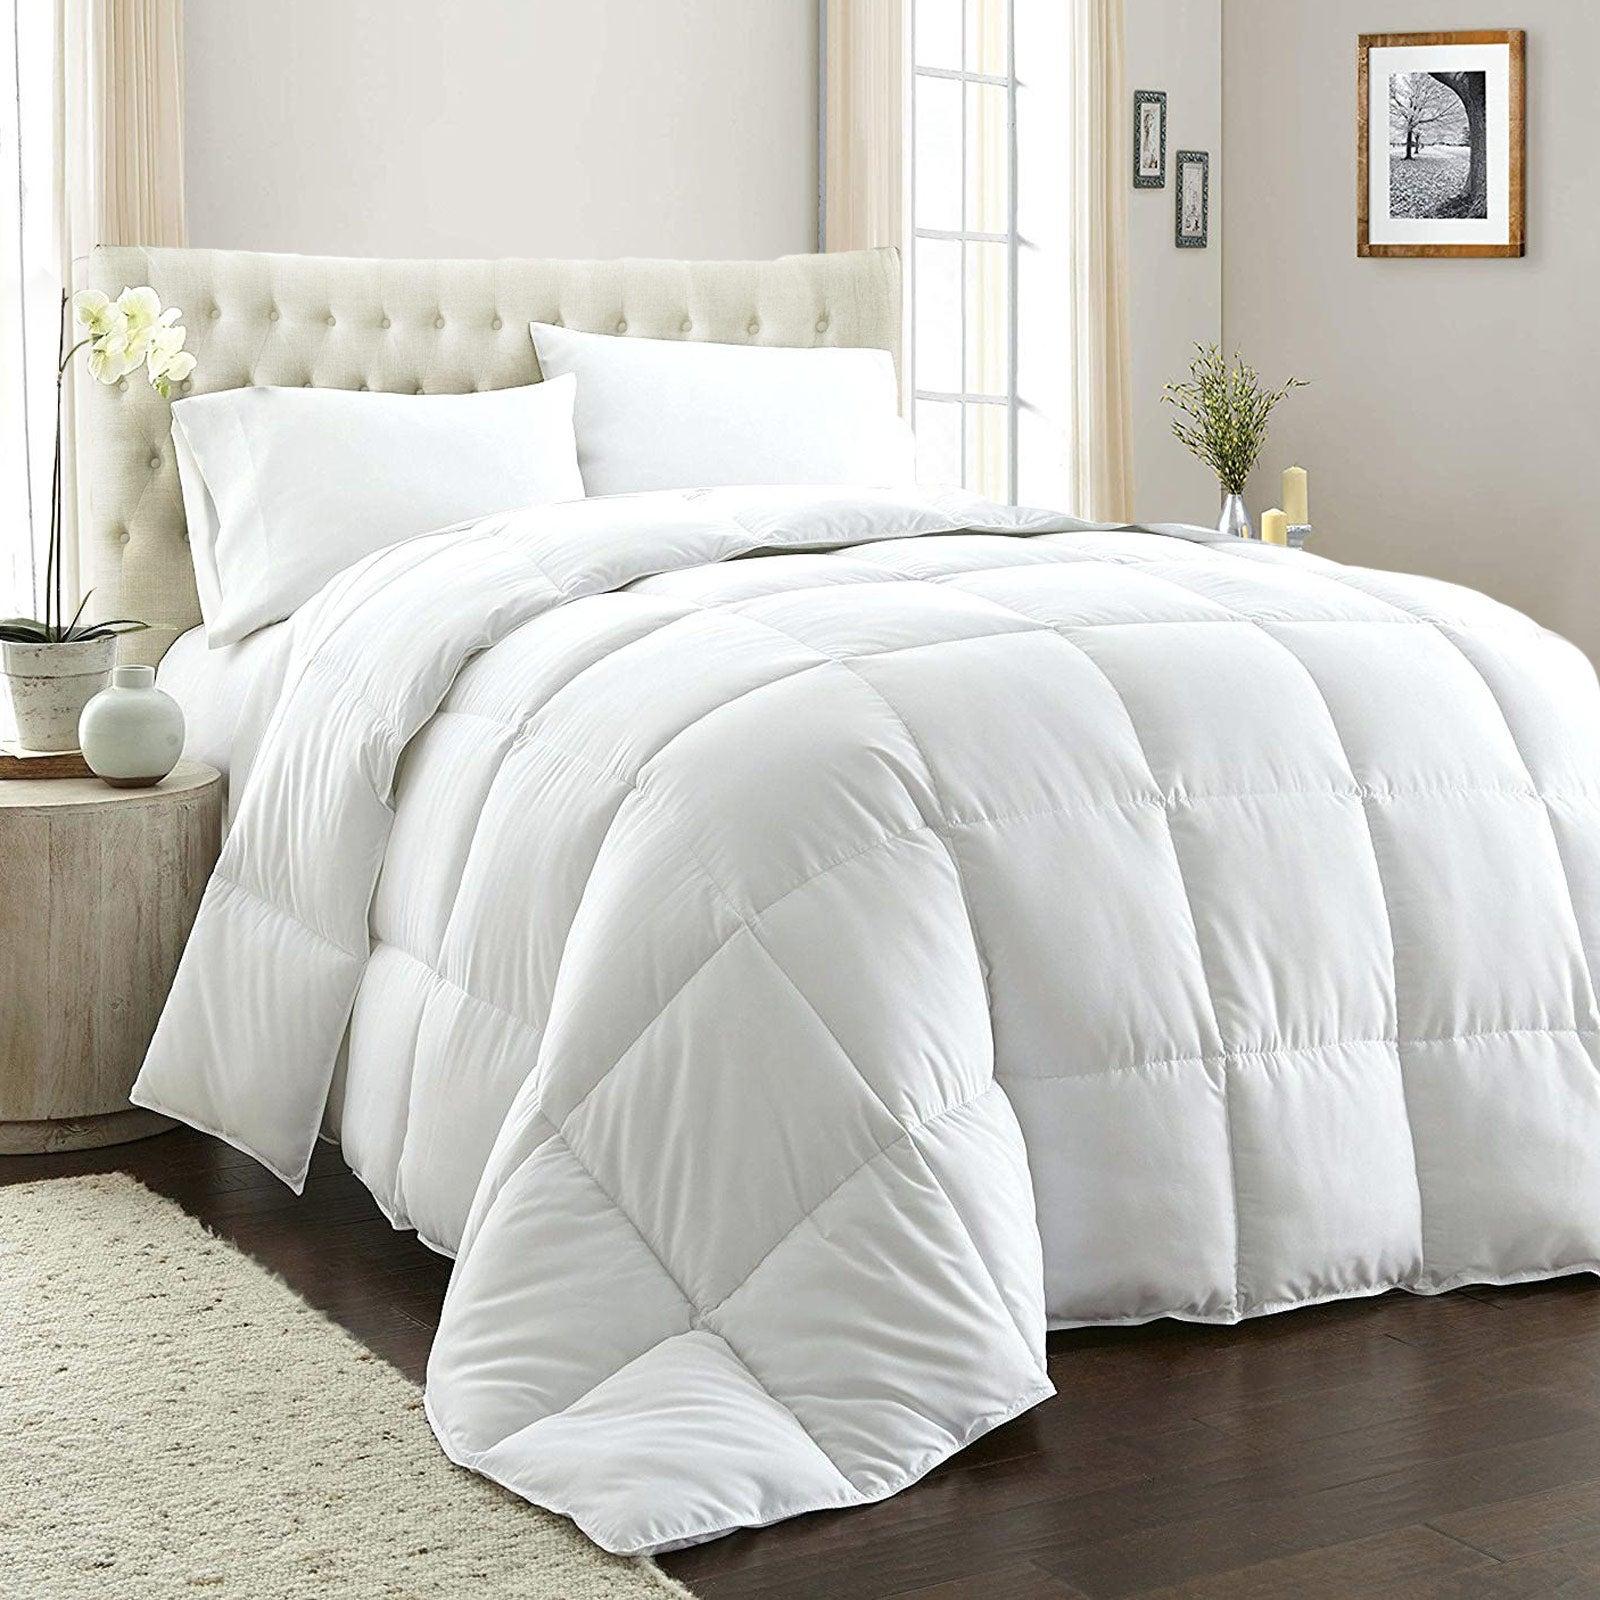 Royal Comfort 800GSM Quilt Down Alternative Doona Duvet Cotton Cover Hotel Grade